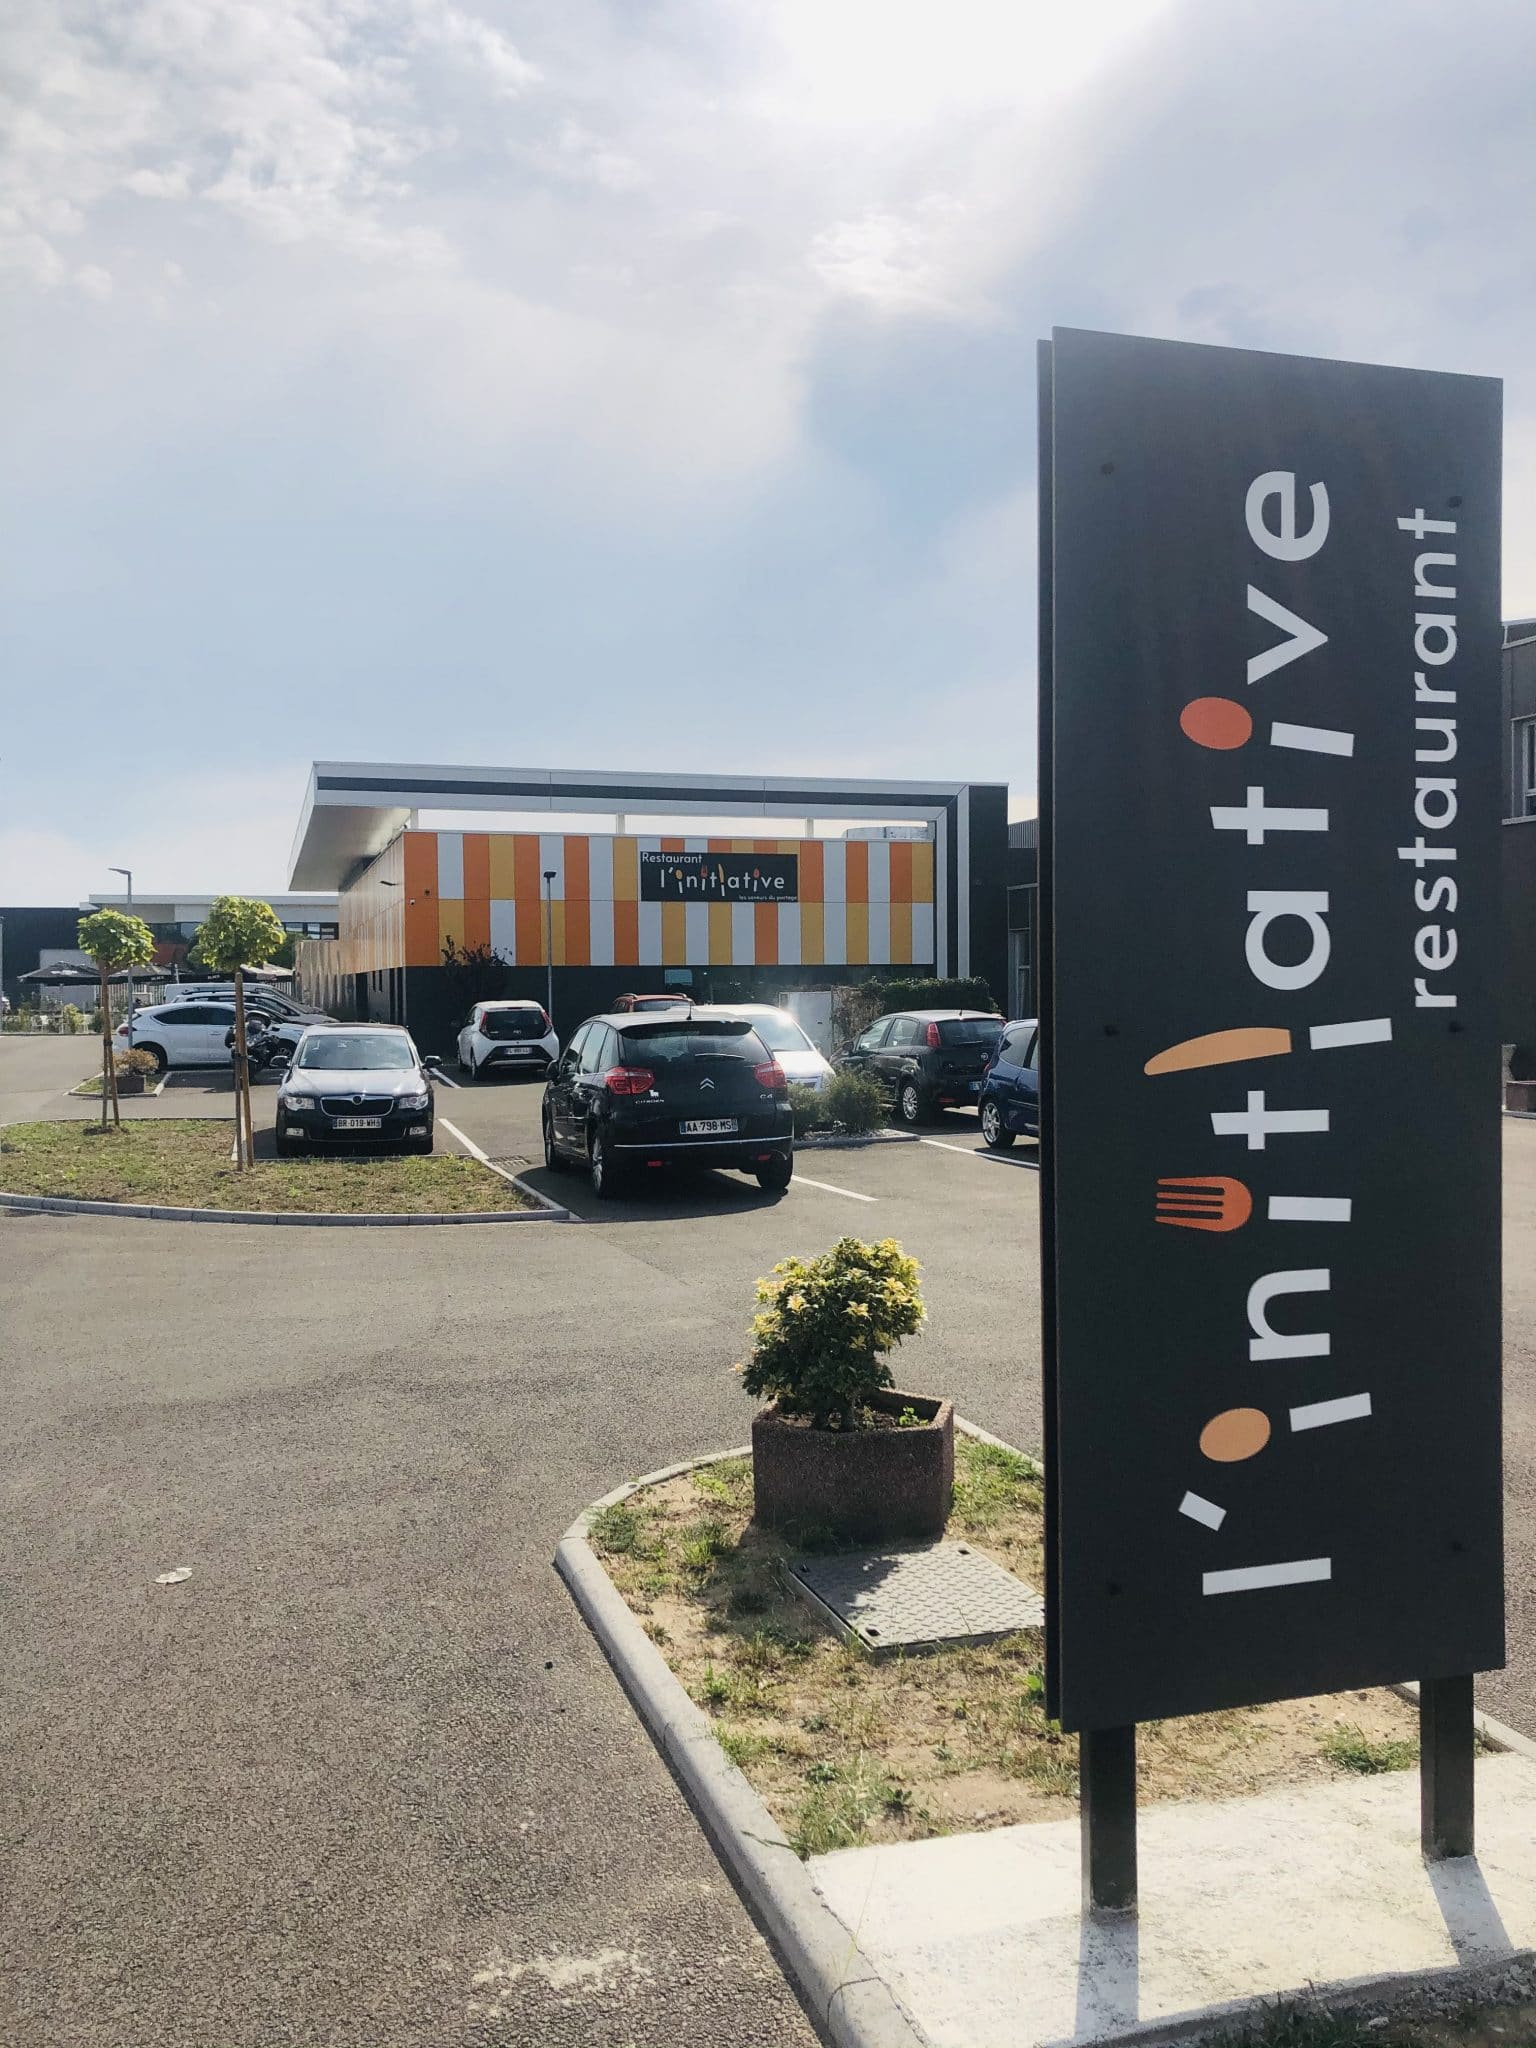 Réalisation AAE - L'Initiative - Haguenau